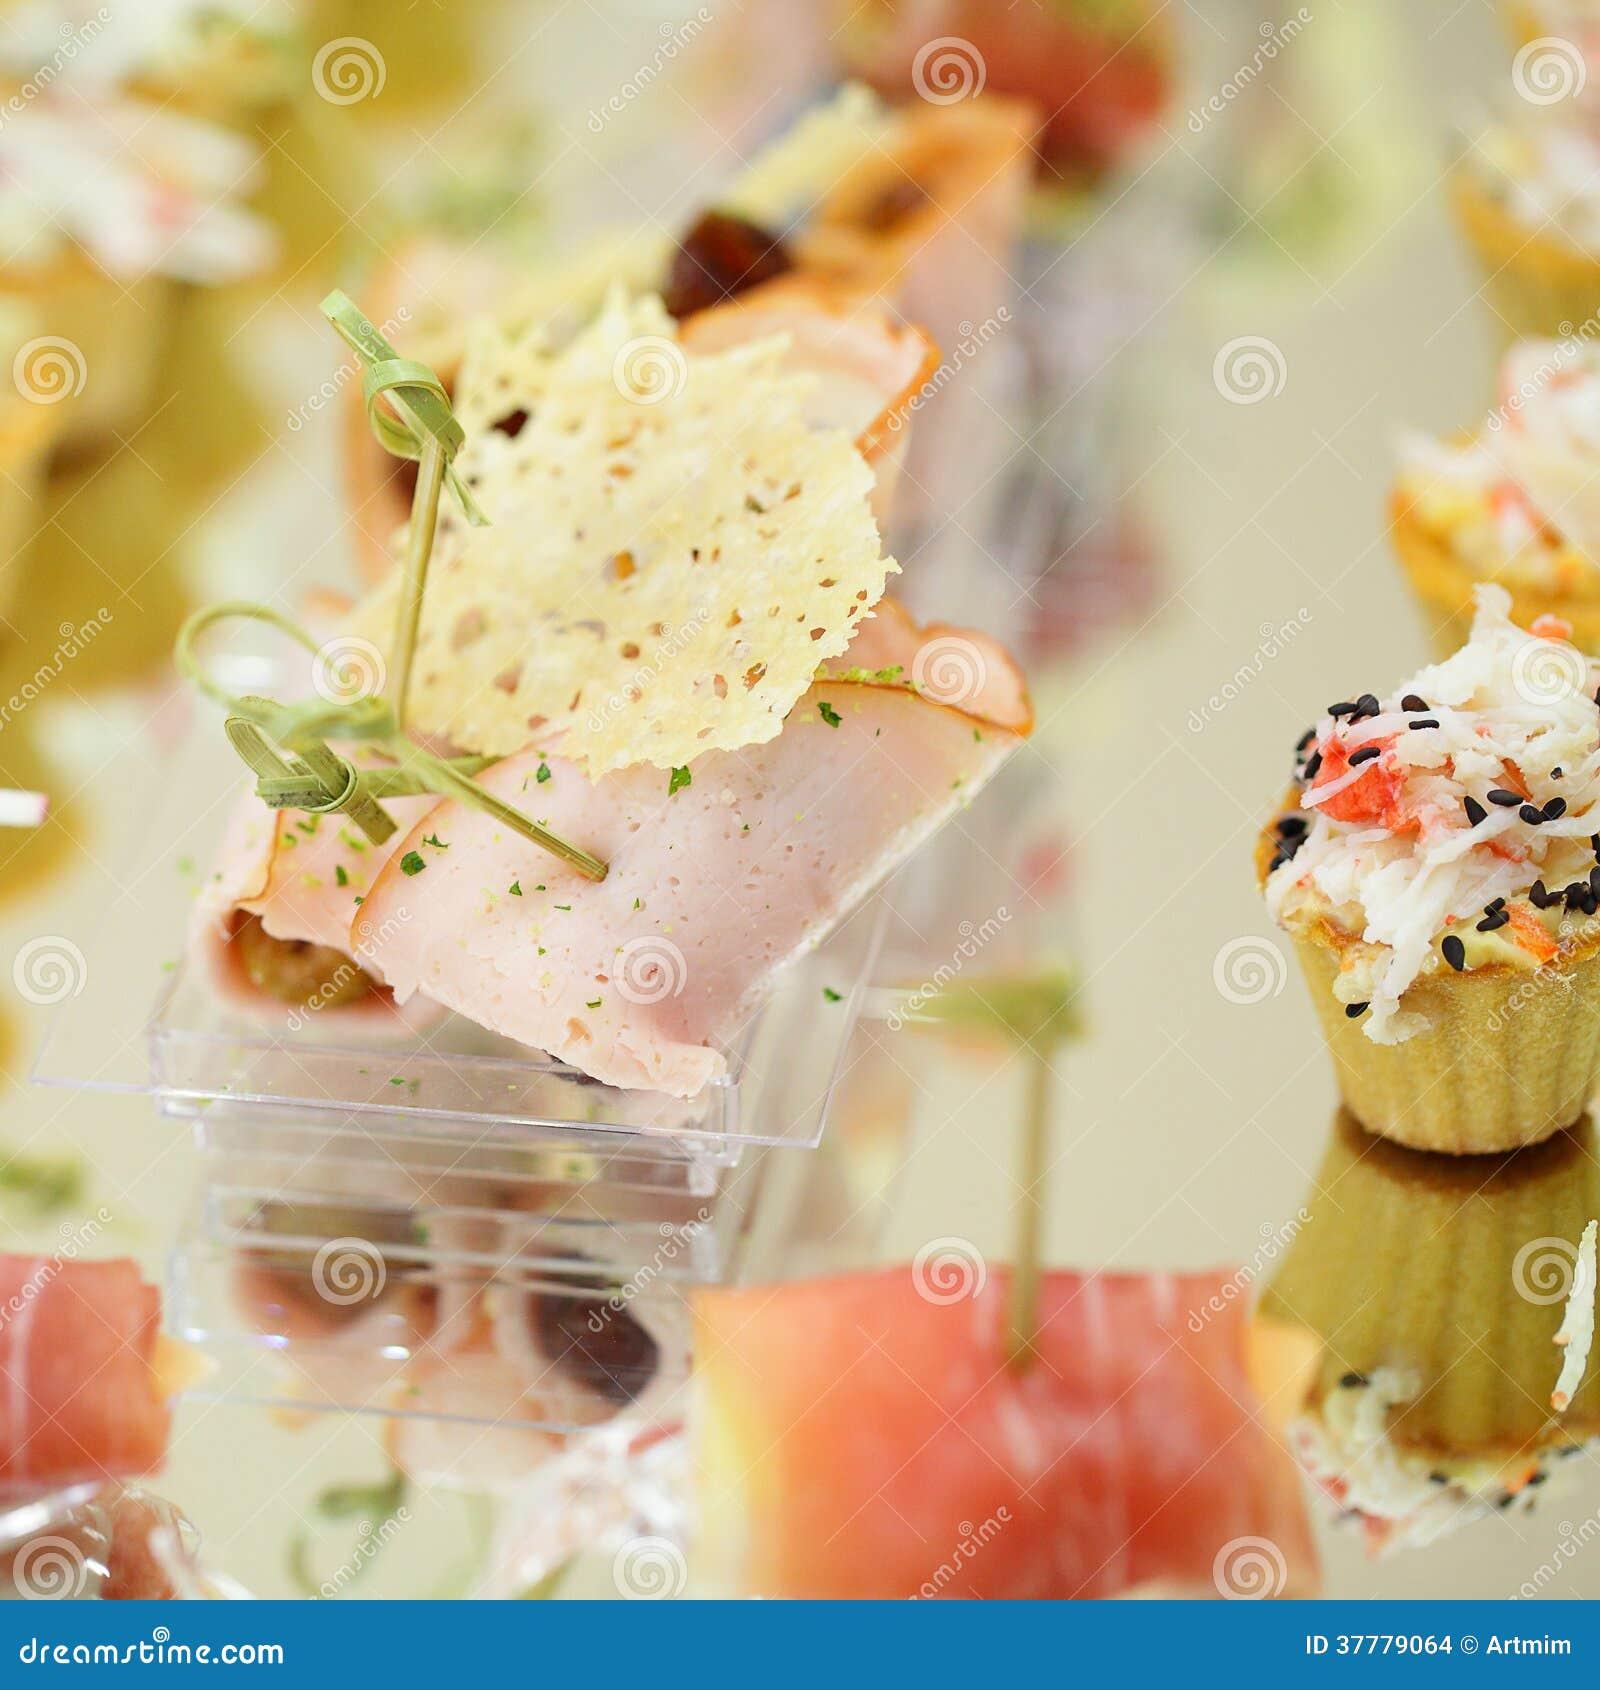 essayez gourmet catering service